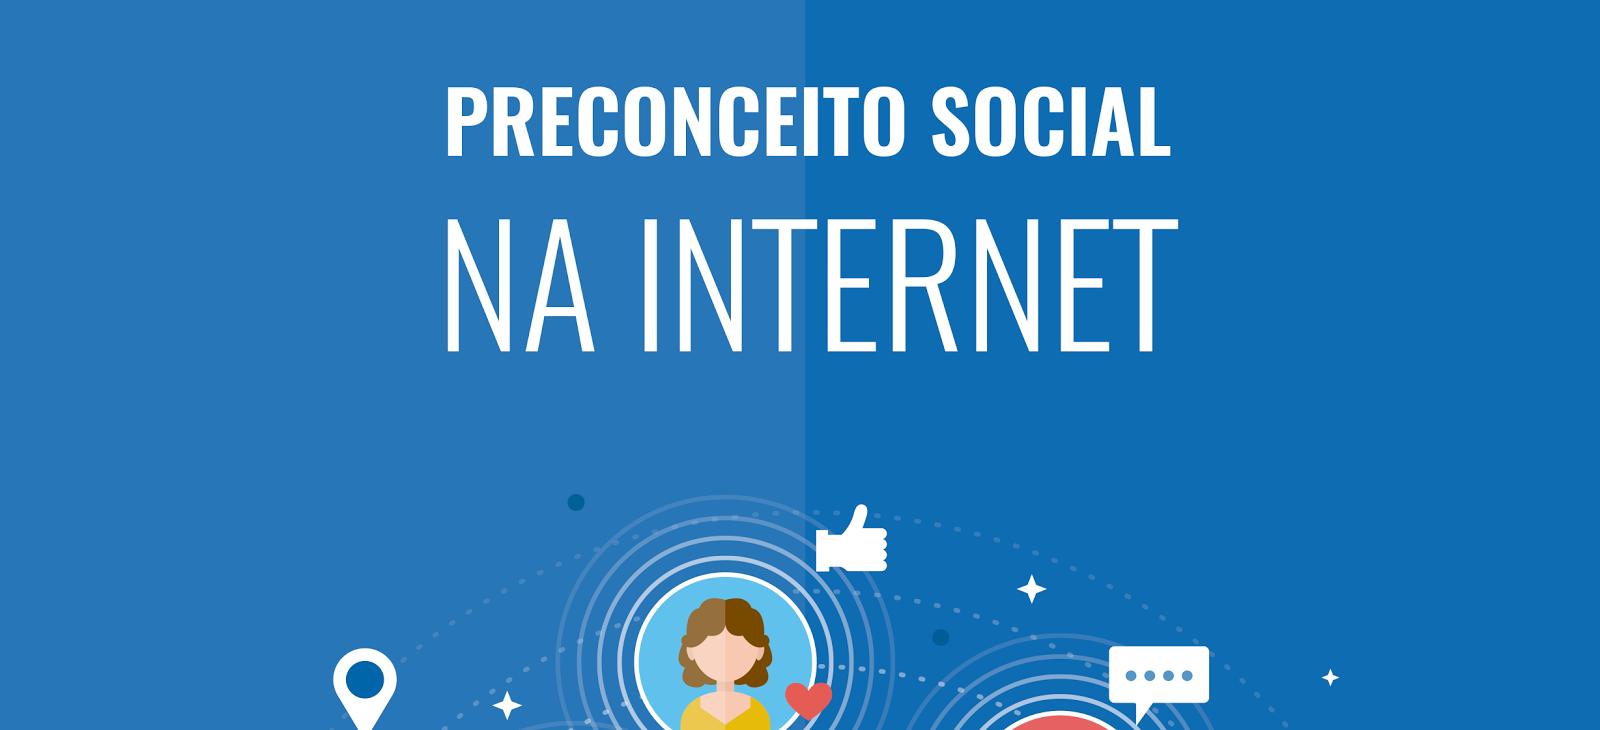 Preconceito social na Internet